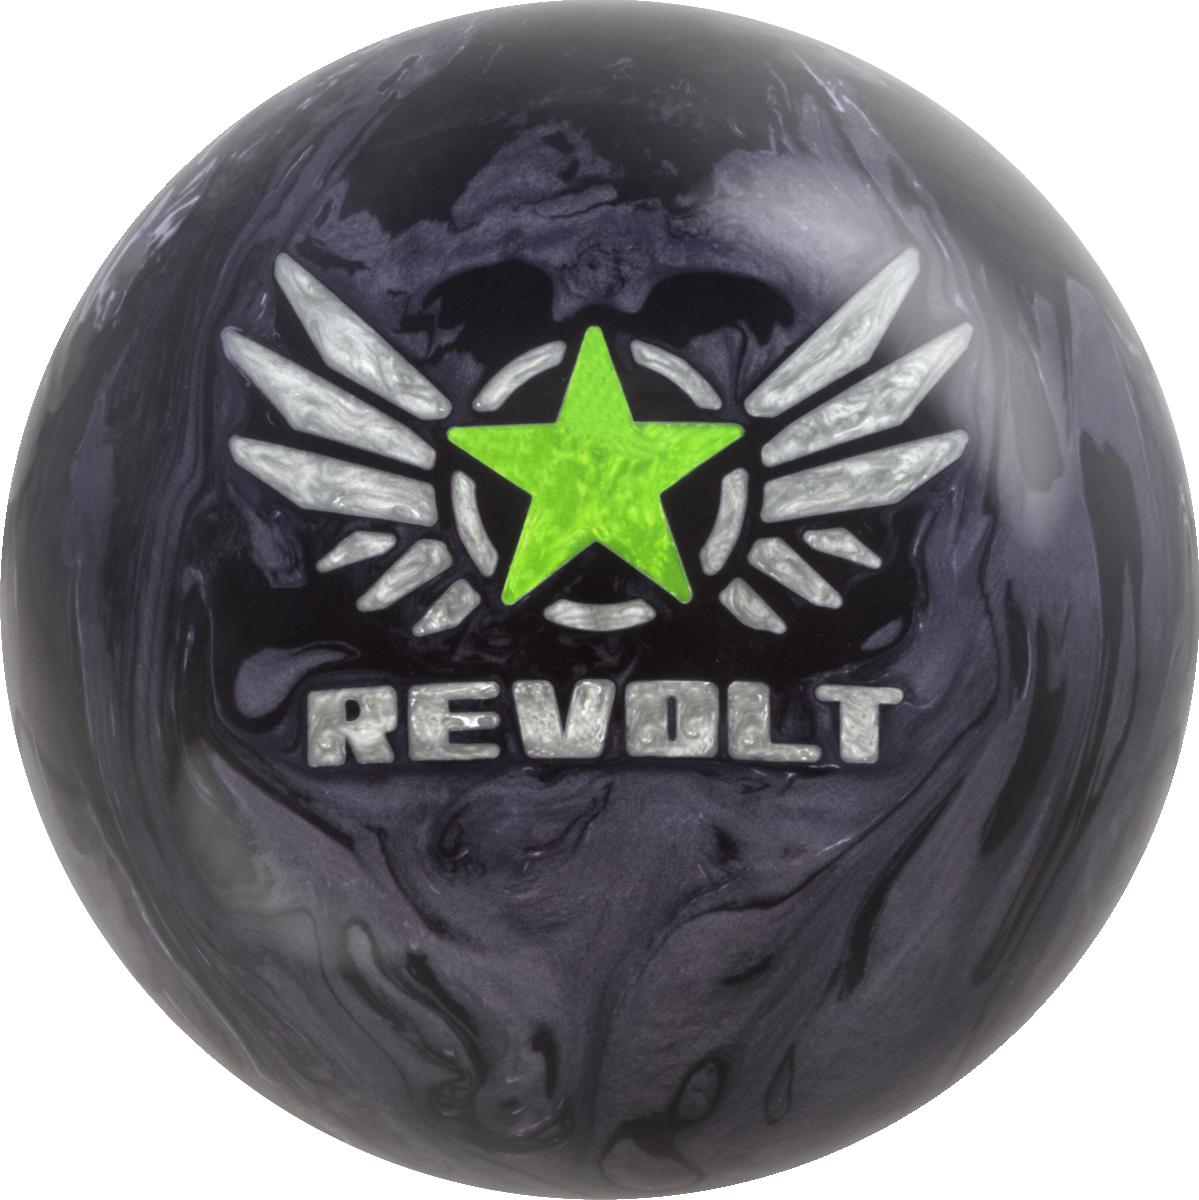 Motiv Revolt Vengeance Motiv Bowling Balls Pinterest Bowling